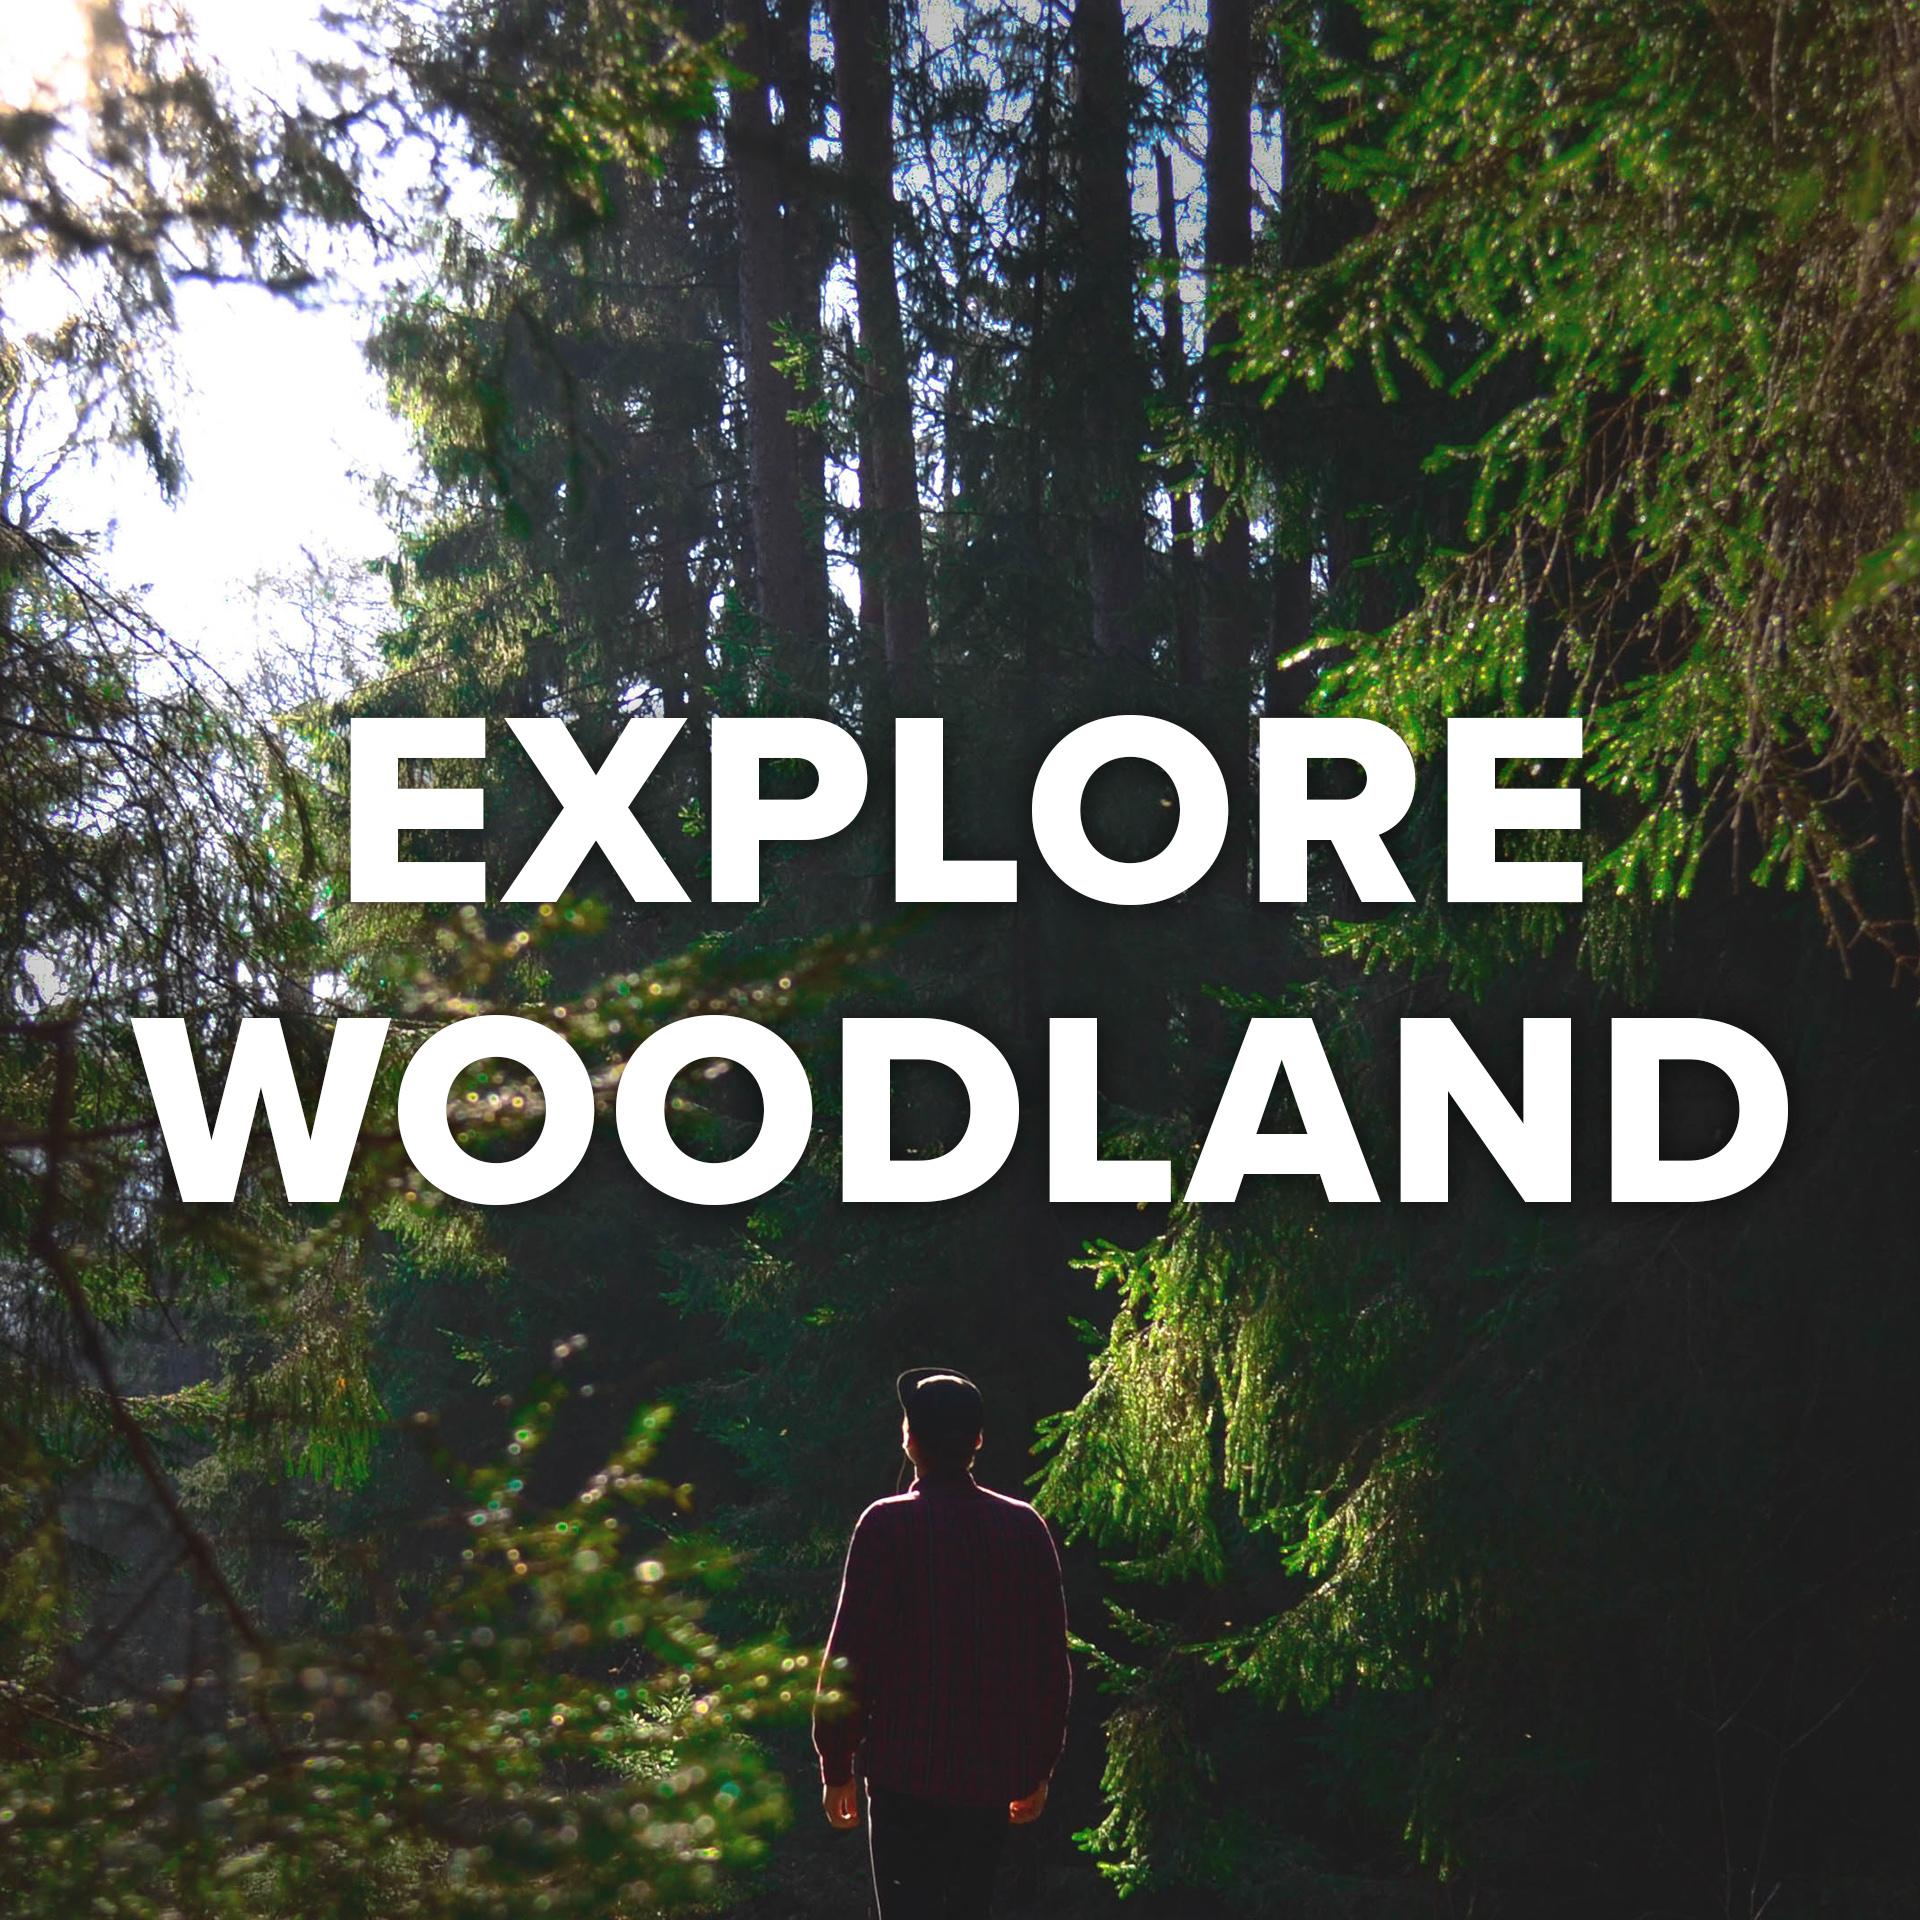 Explore Woodland.jpg